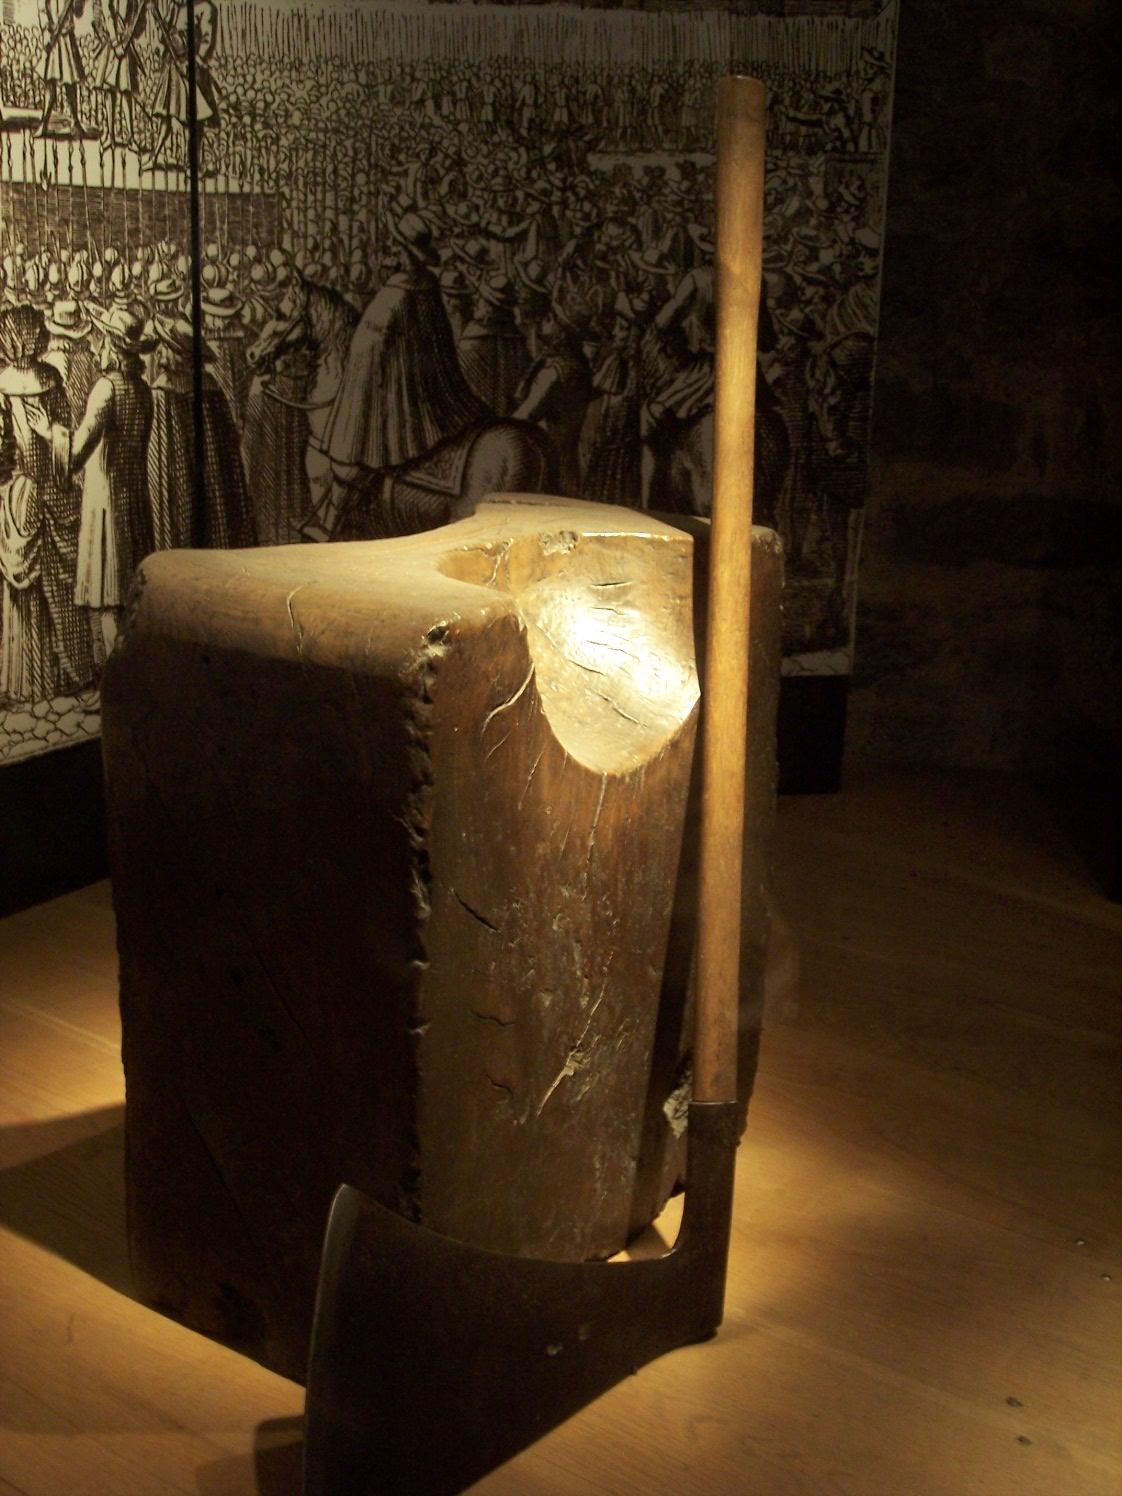 Medieval torture and punishment erotic videos